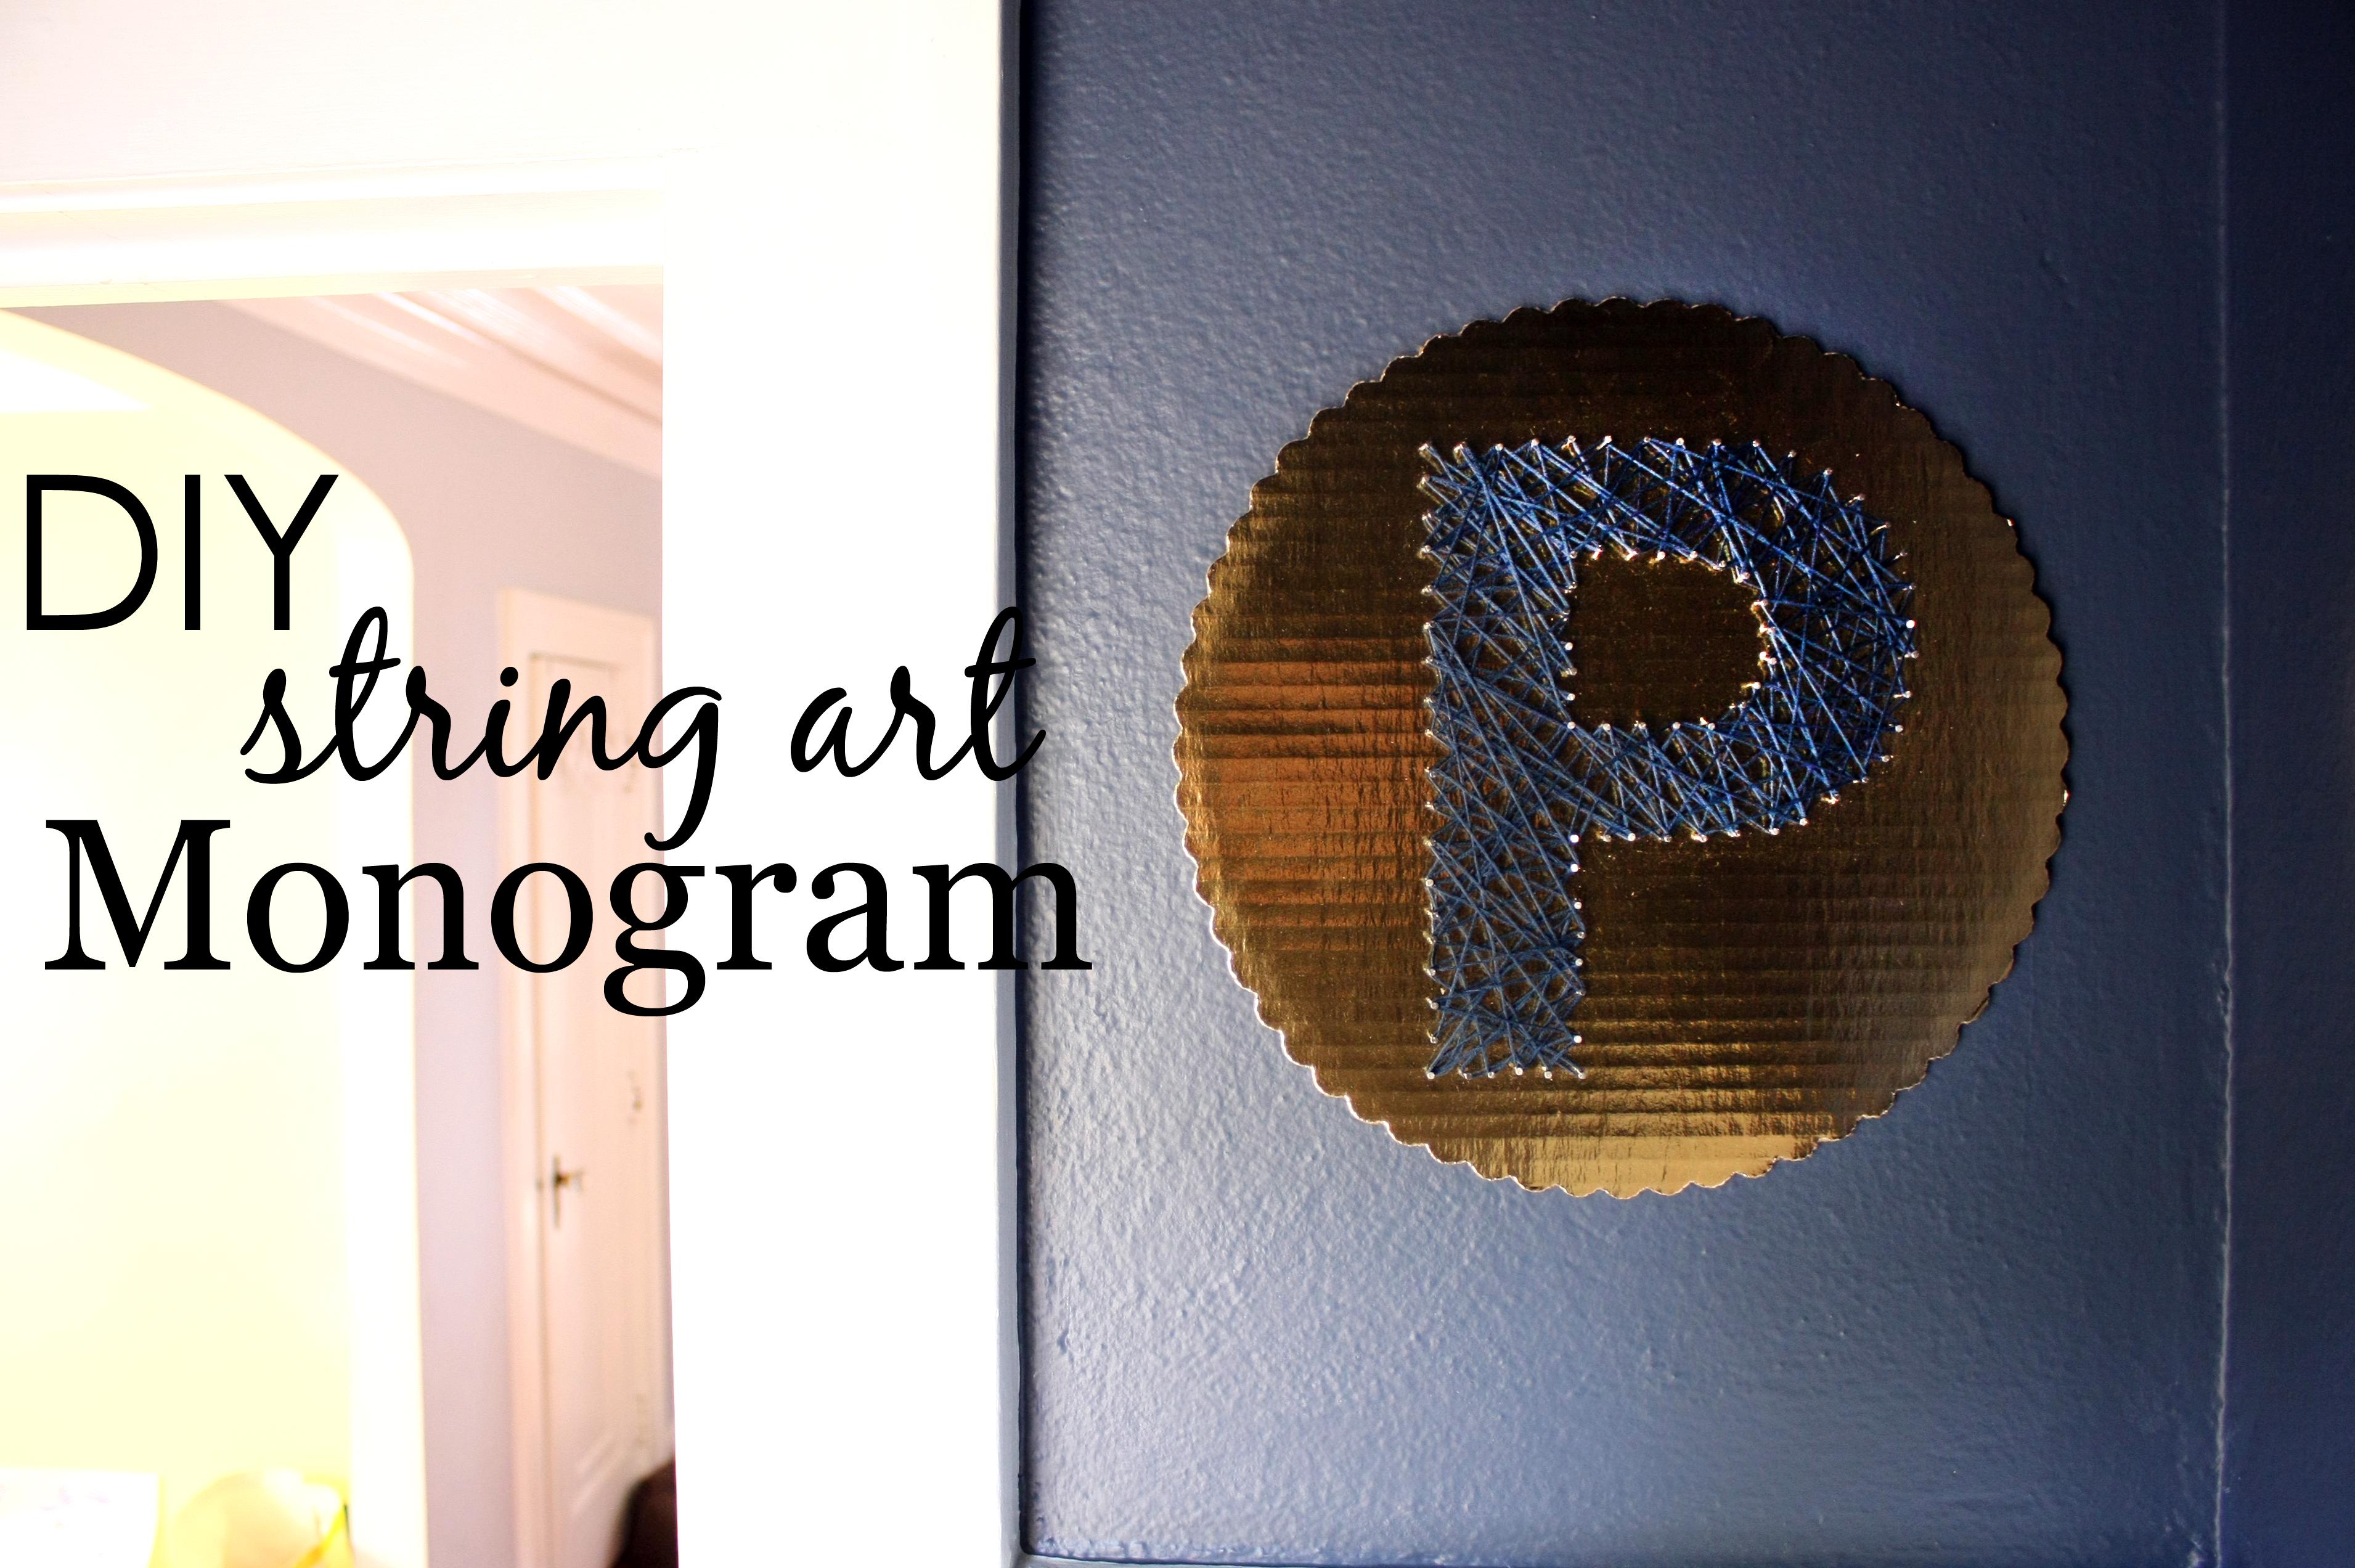 DIY String Art Monogram